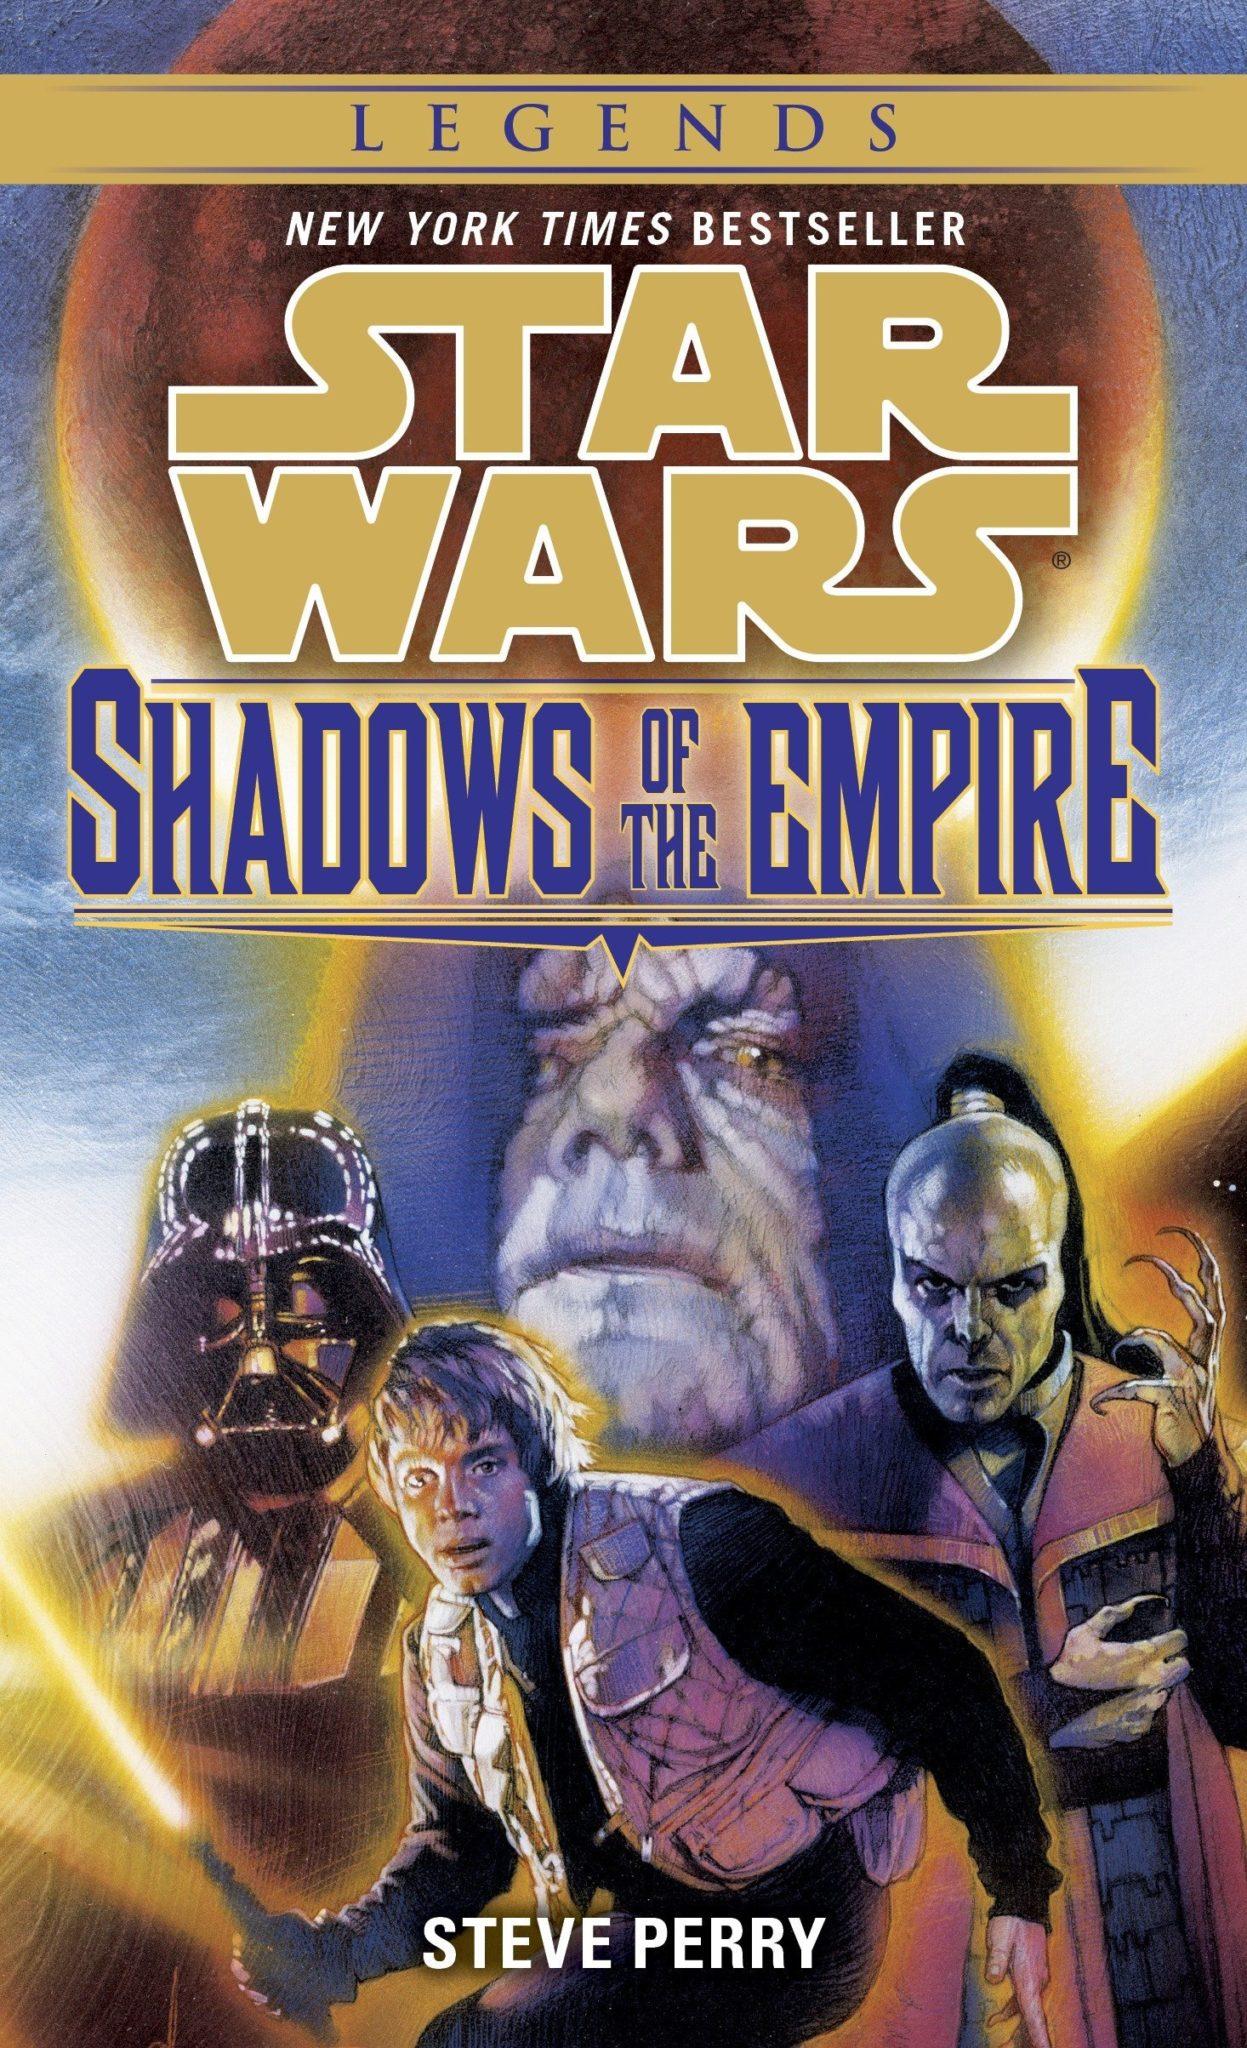 Star Wars books 10